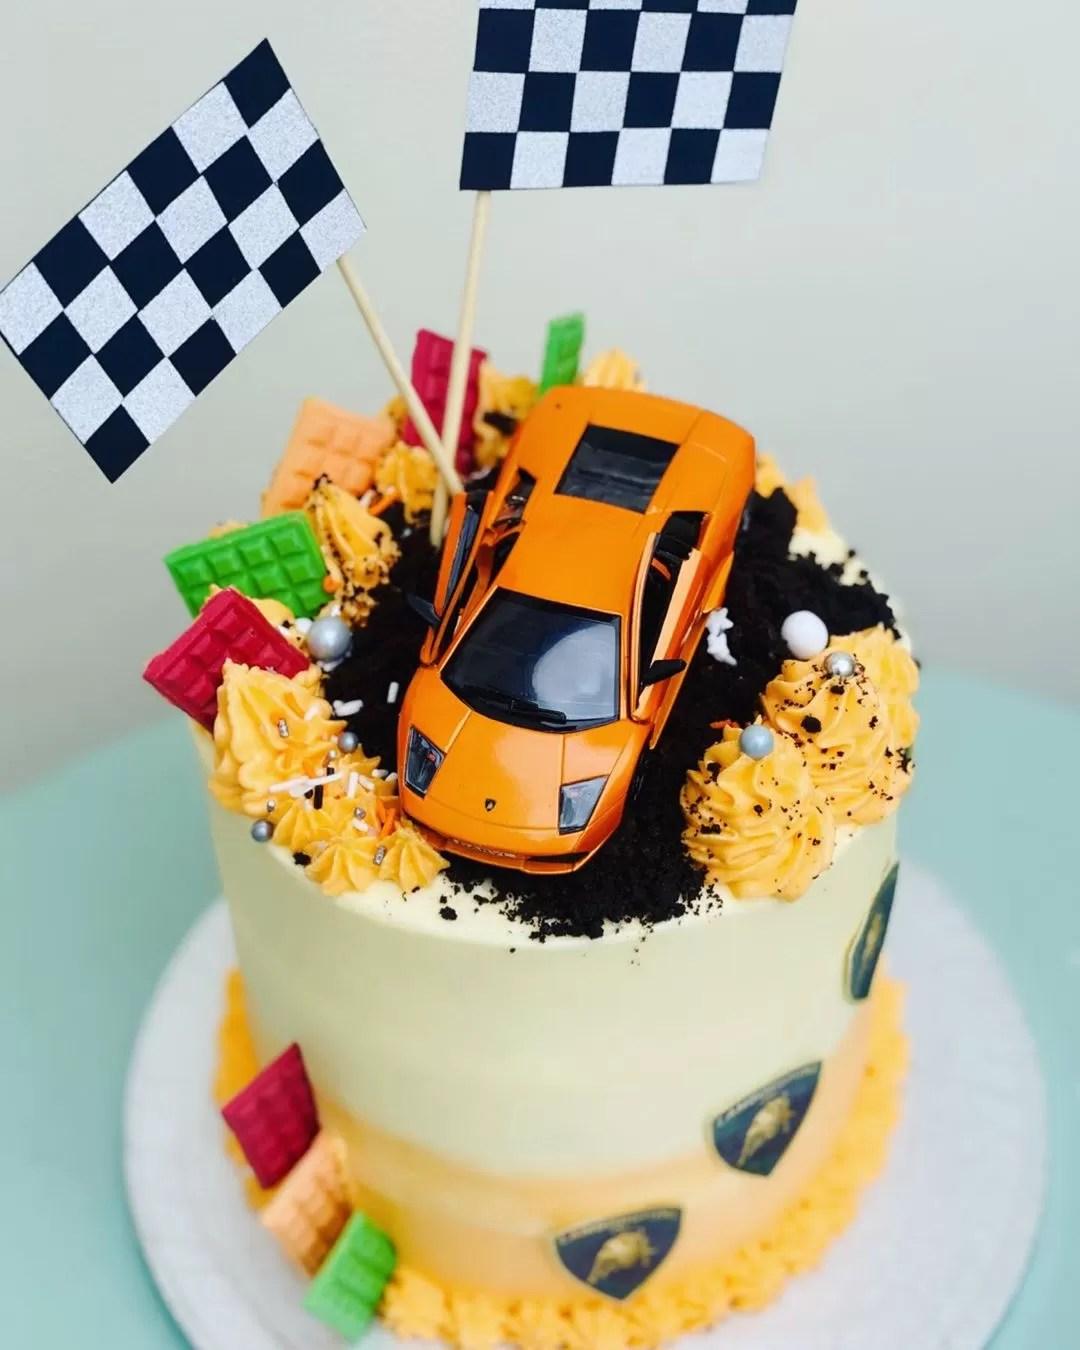 20 Best 2nd Birthday Cake For Baby Boy Of 2021